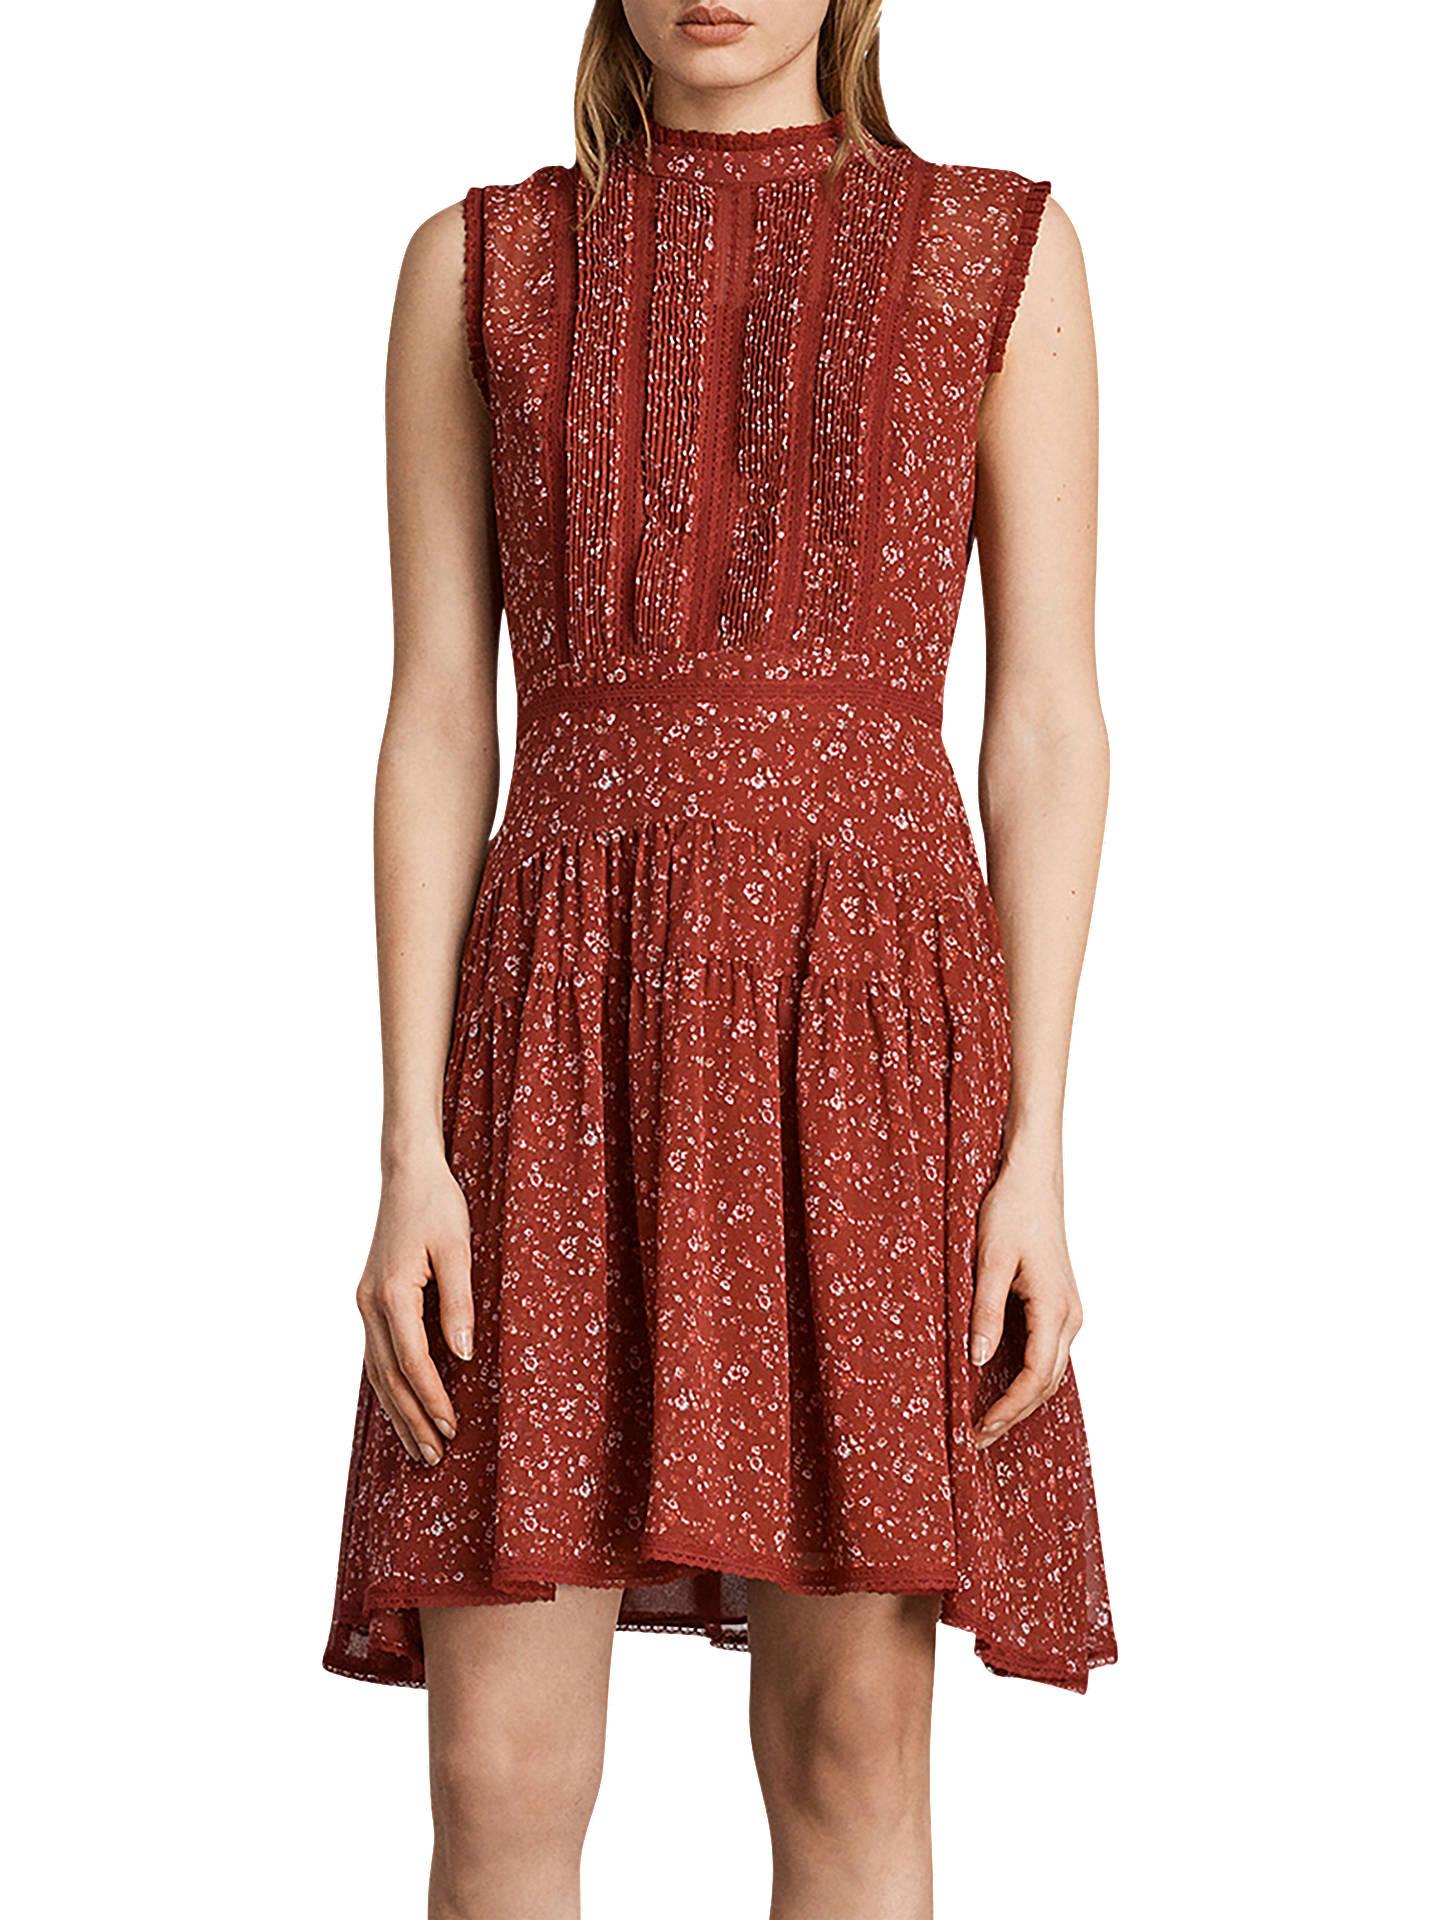 078f8211409 Buy AllSaints Myra Pepper Dress